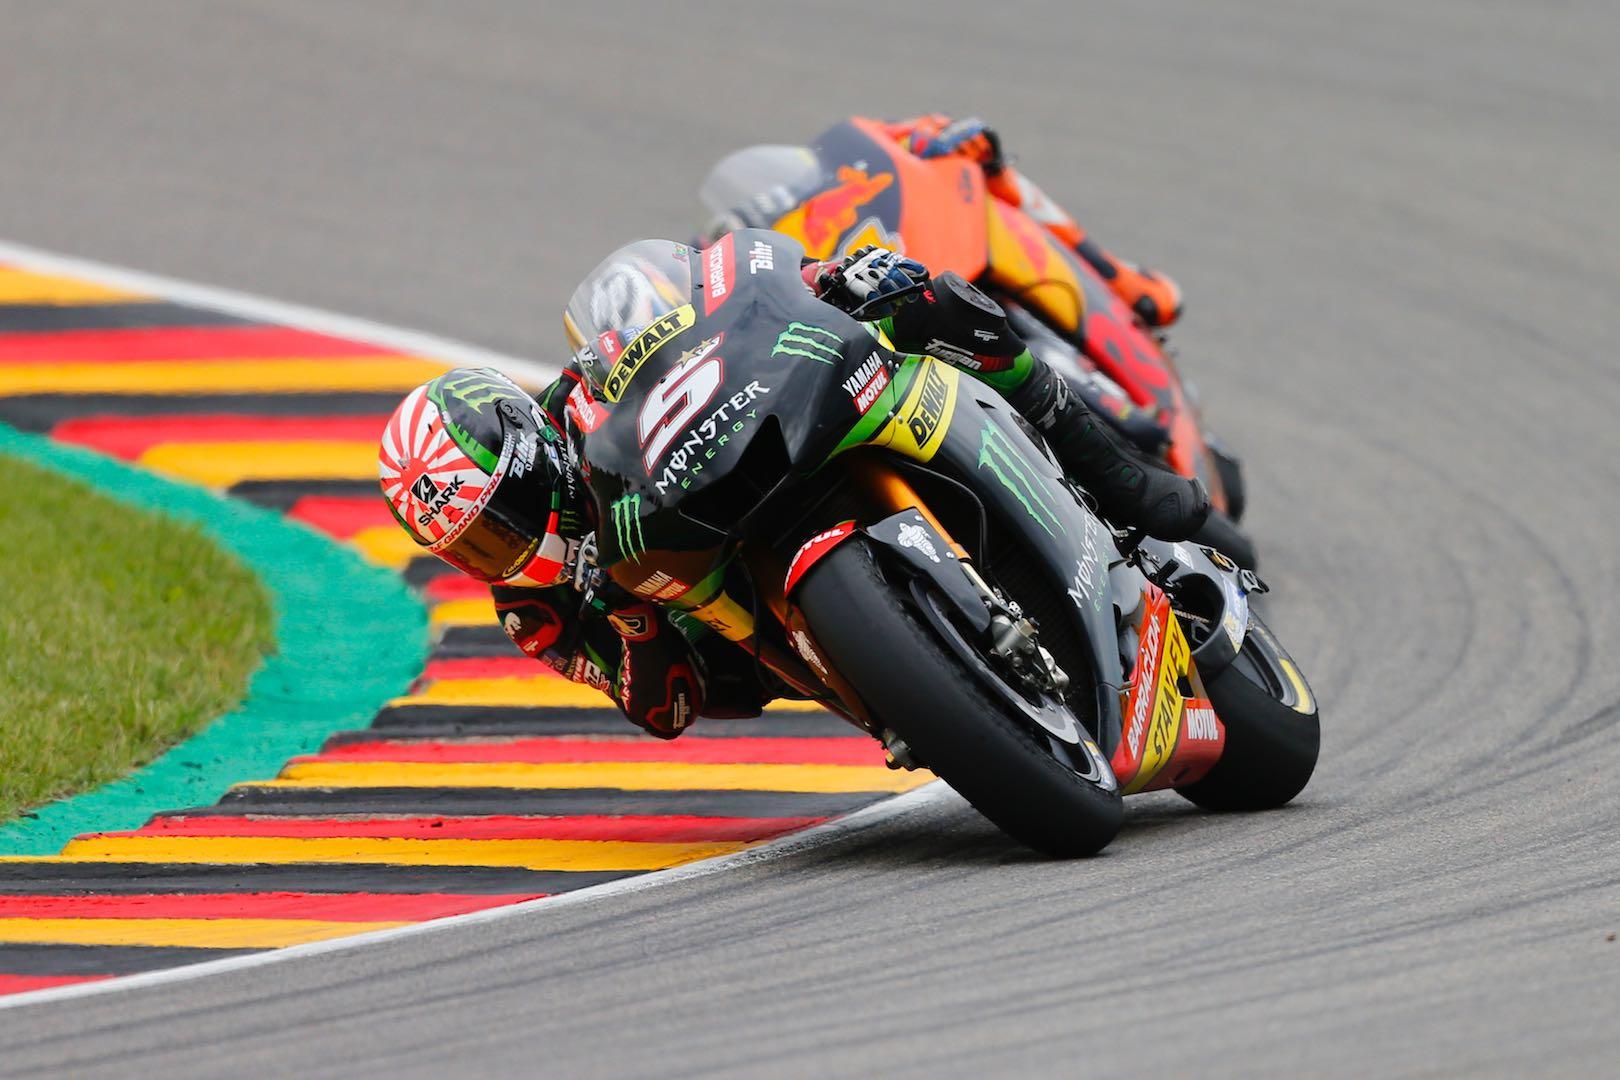 2017 Sachsenring MotoGP Results: Germany Grand Prix Results: Yamaha's Johann Zarco